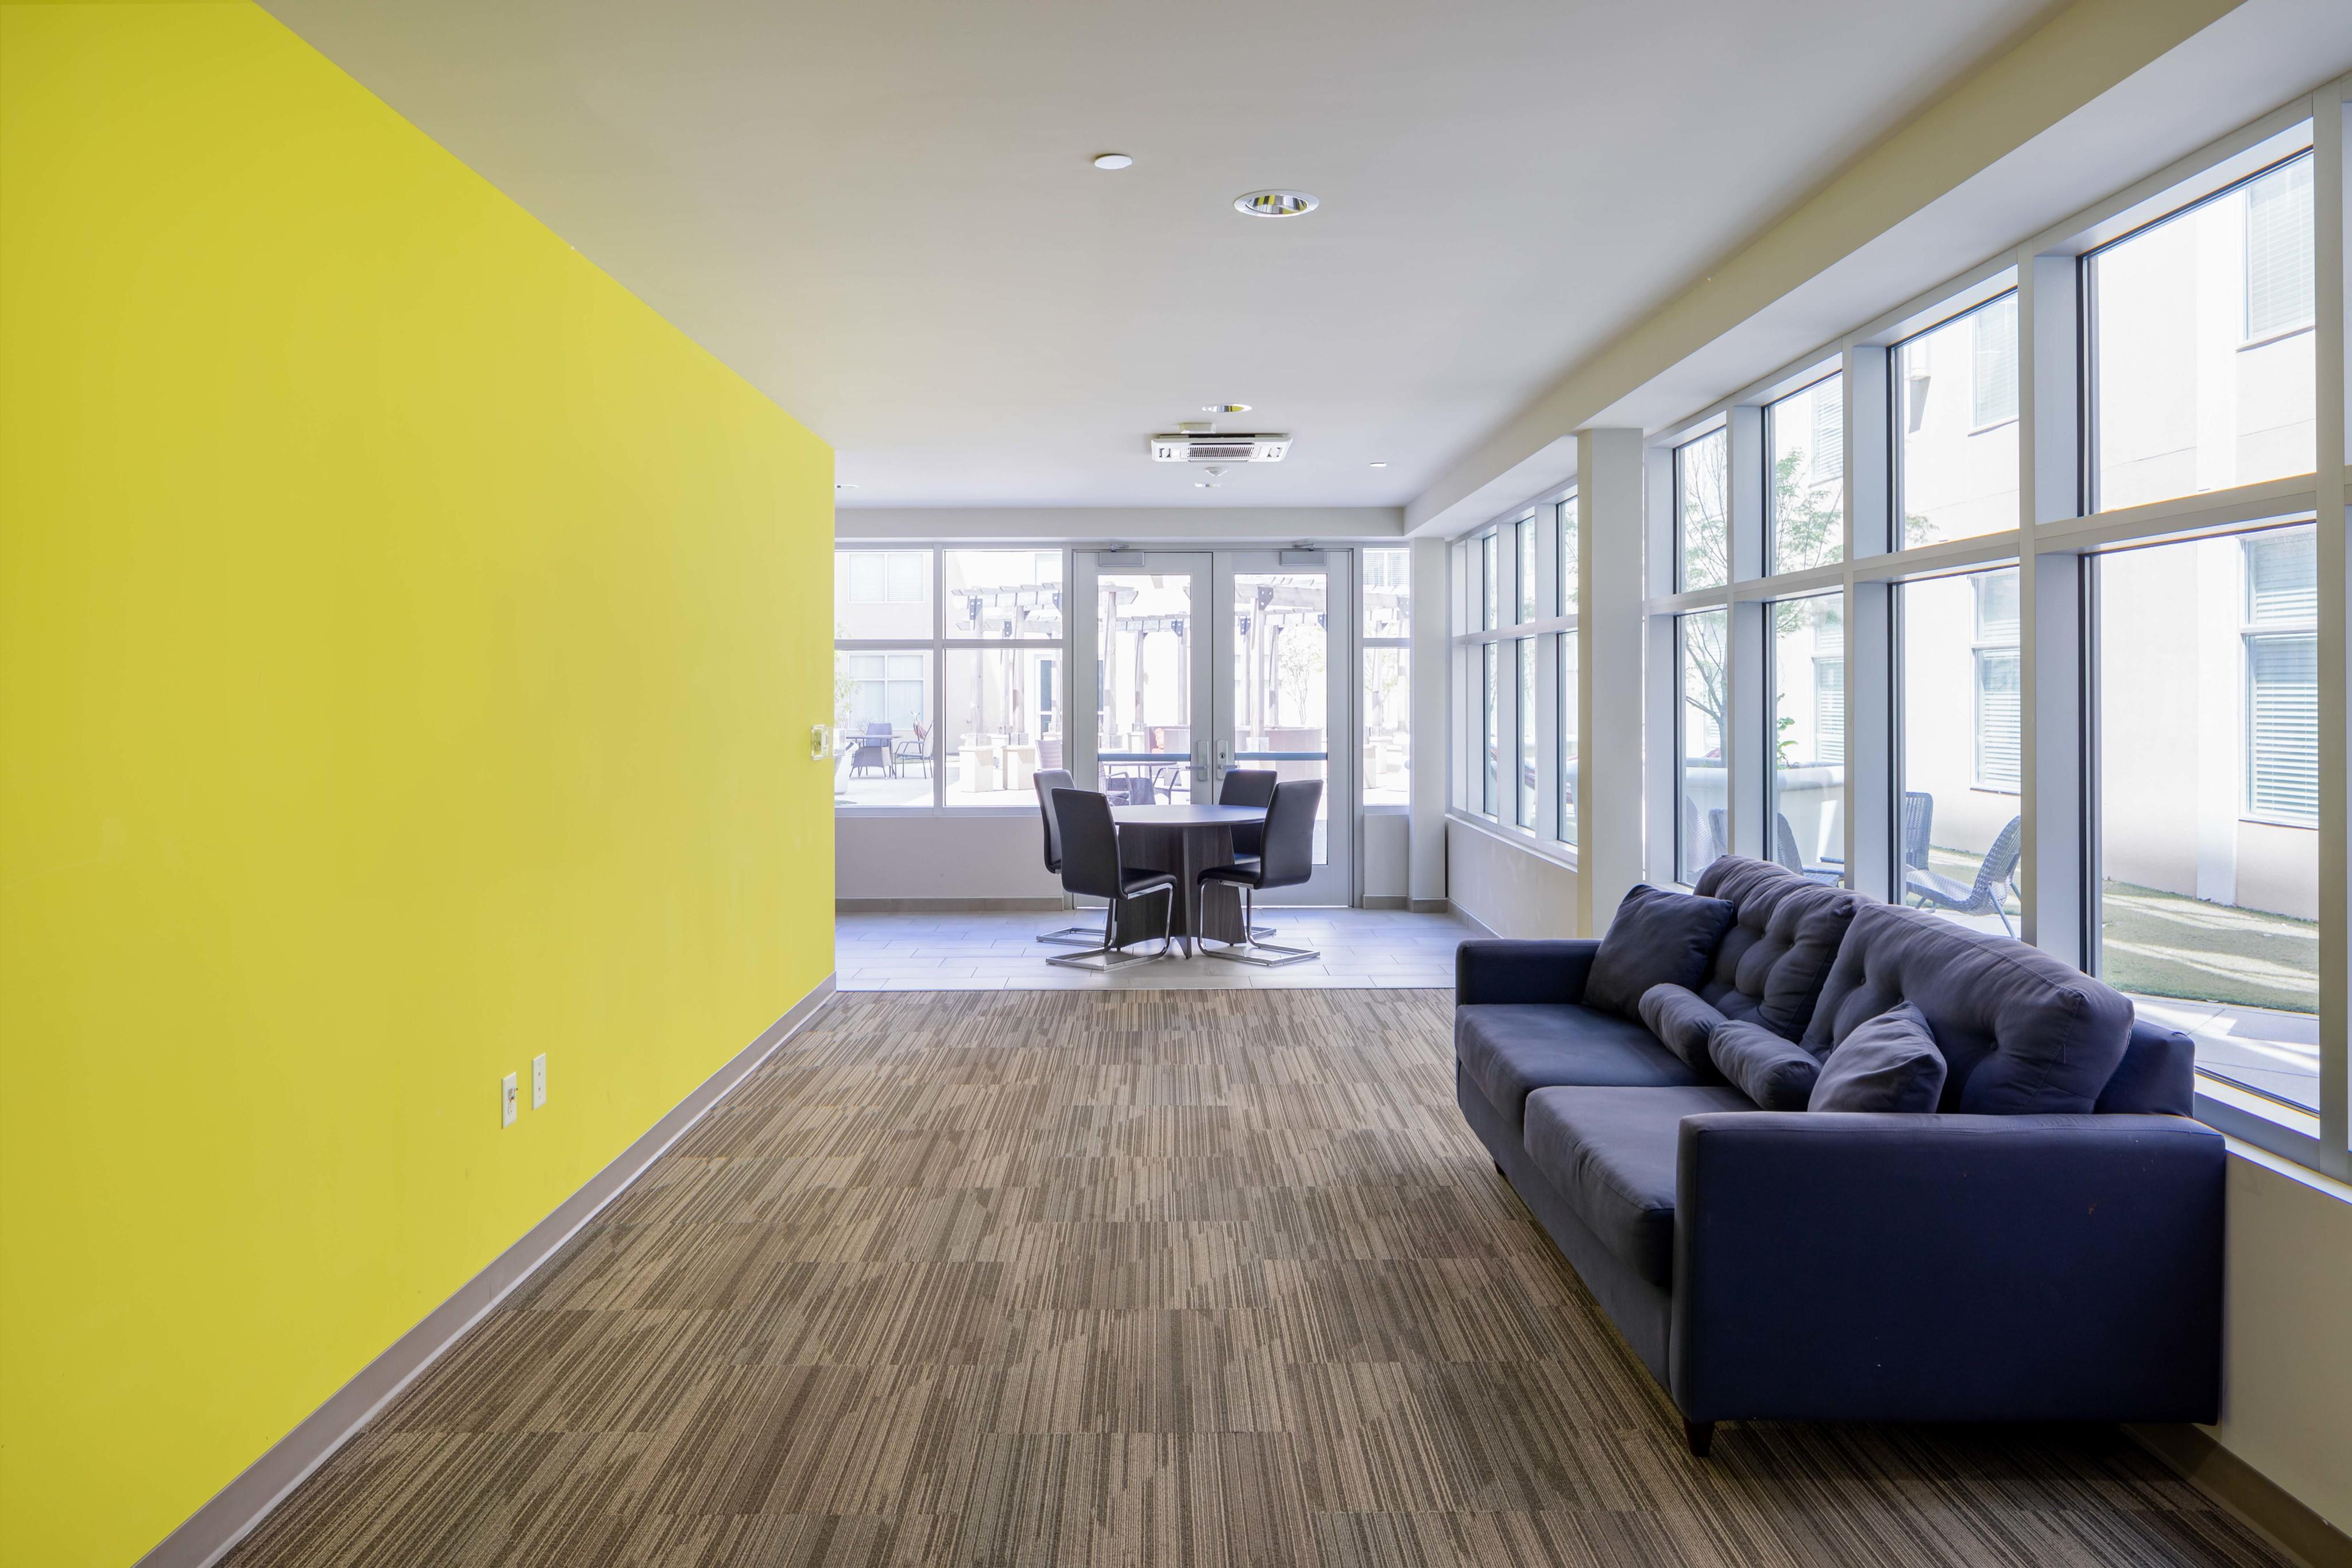 Study Room on Each Floor